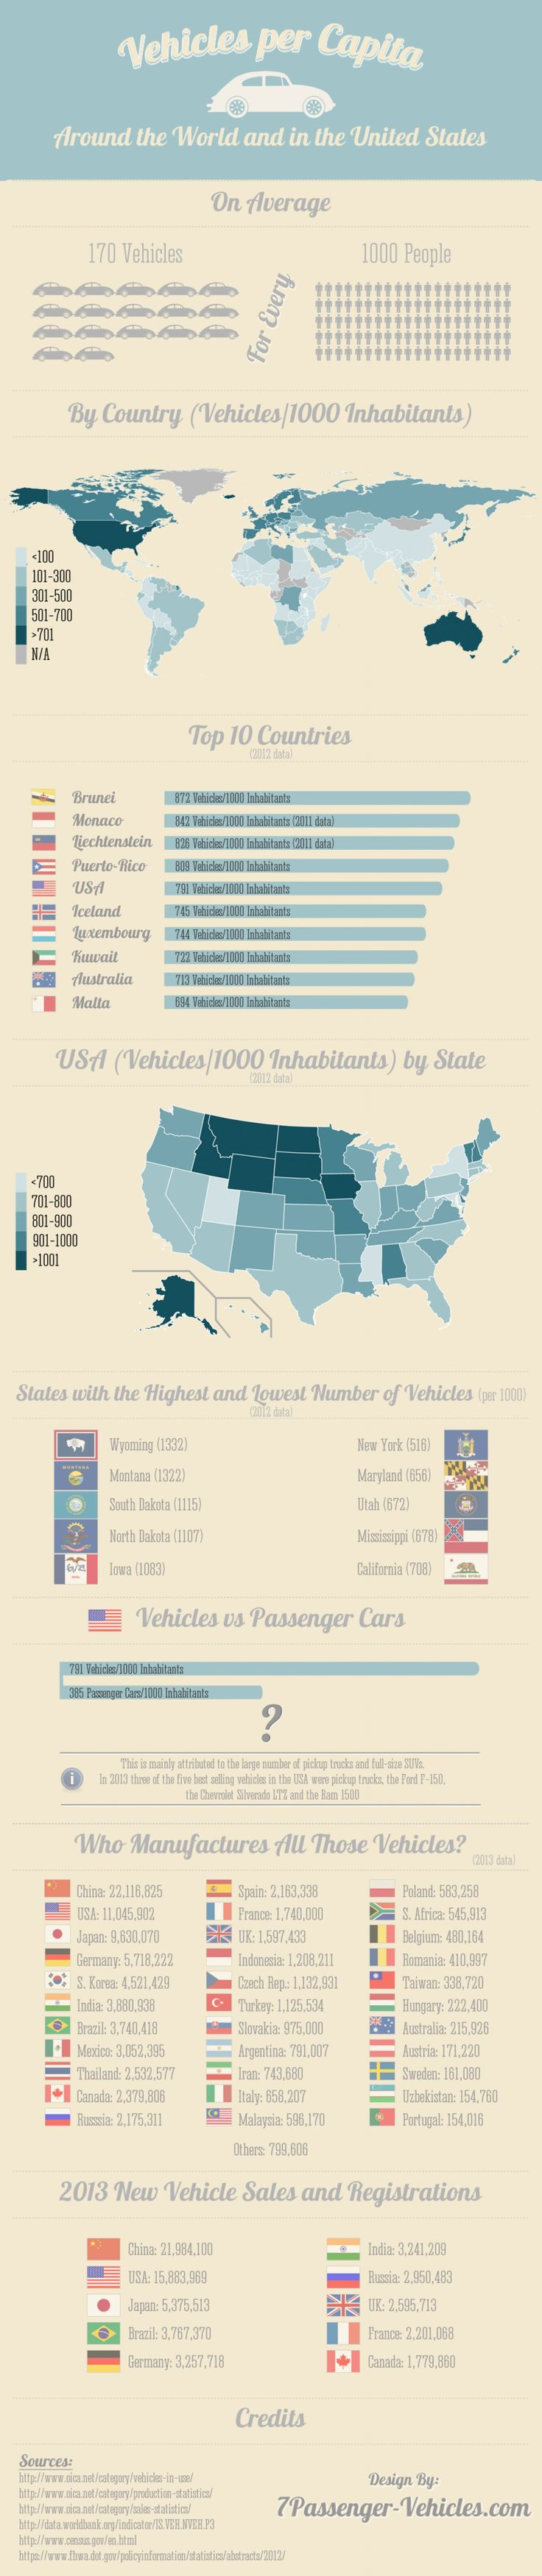 Vehicles per Capita Infographic